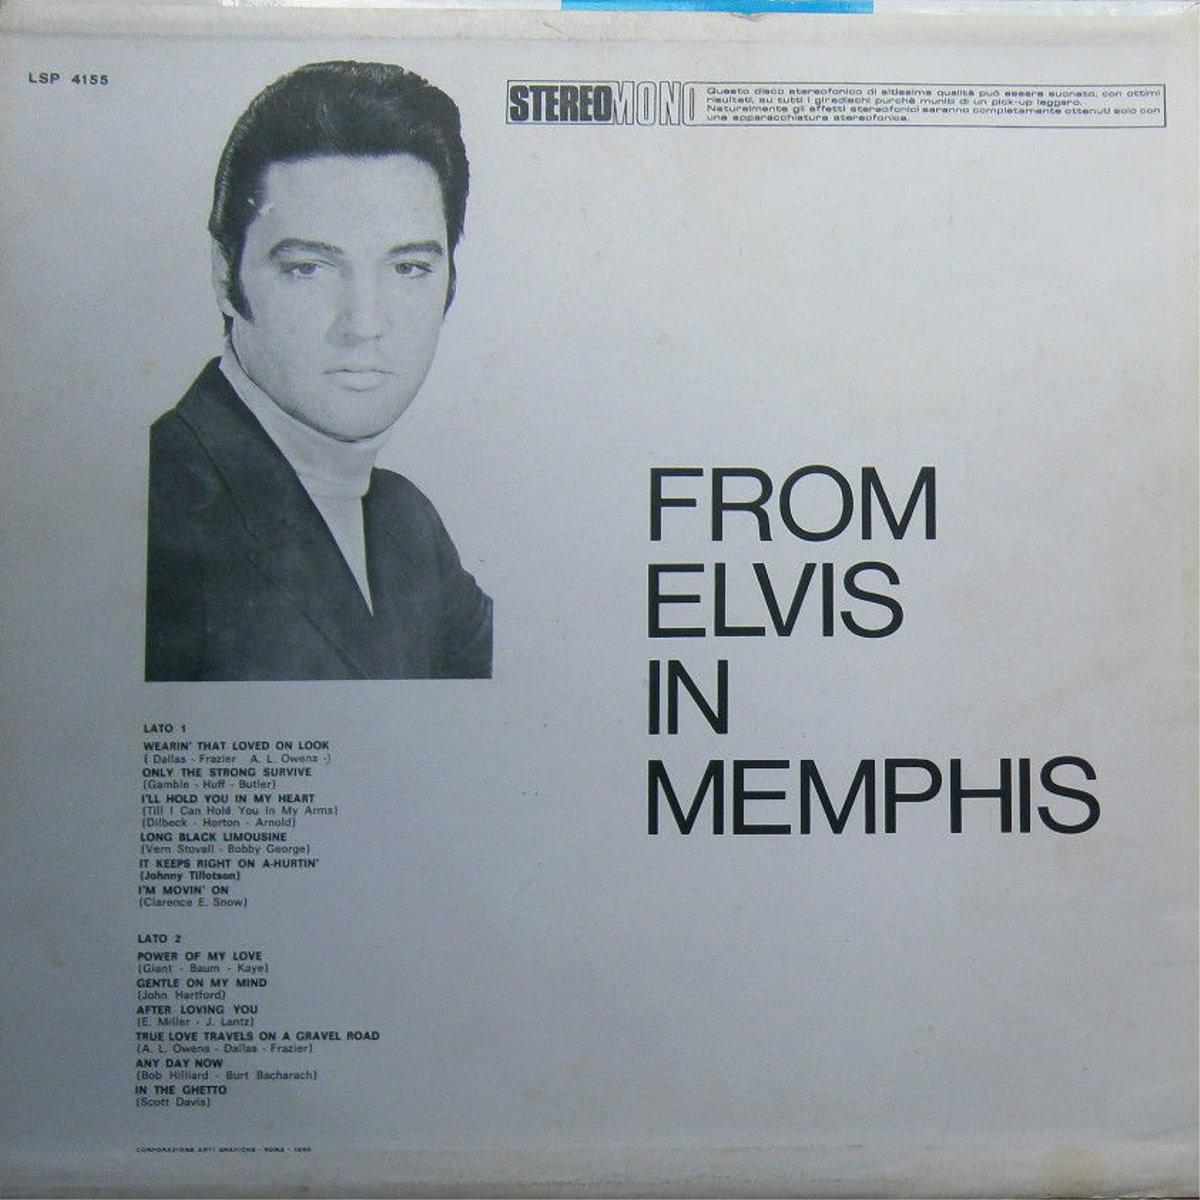 FROM ELVIS IN MEMPHIS Lsp4155bdksb6